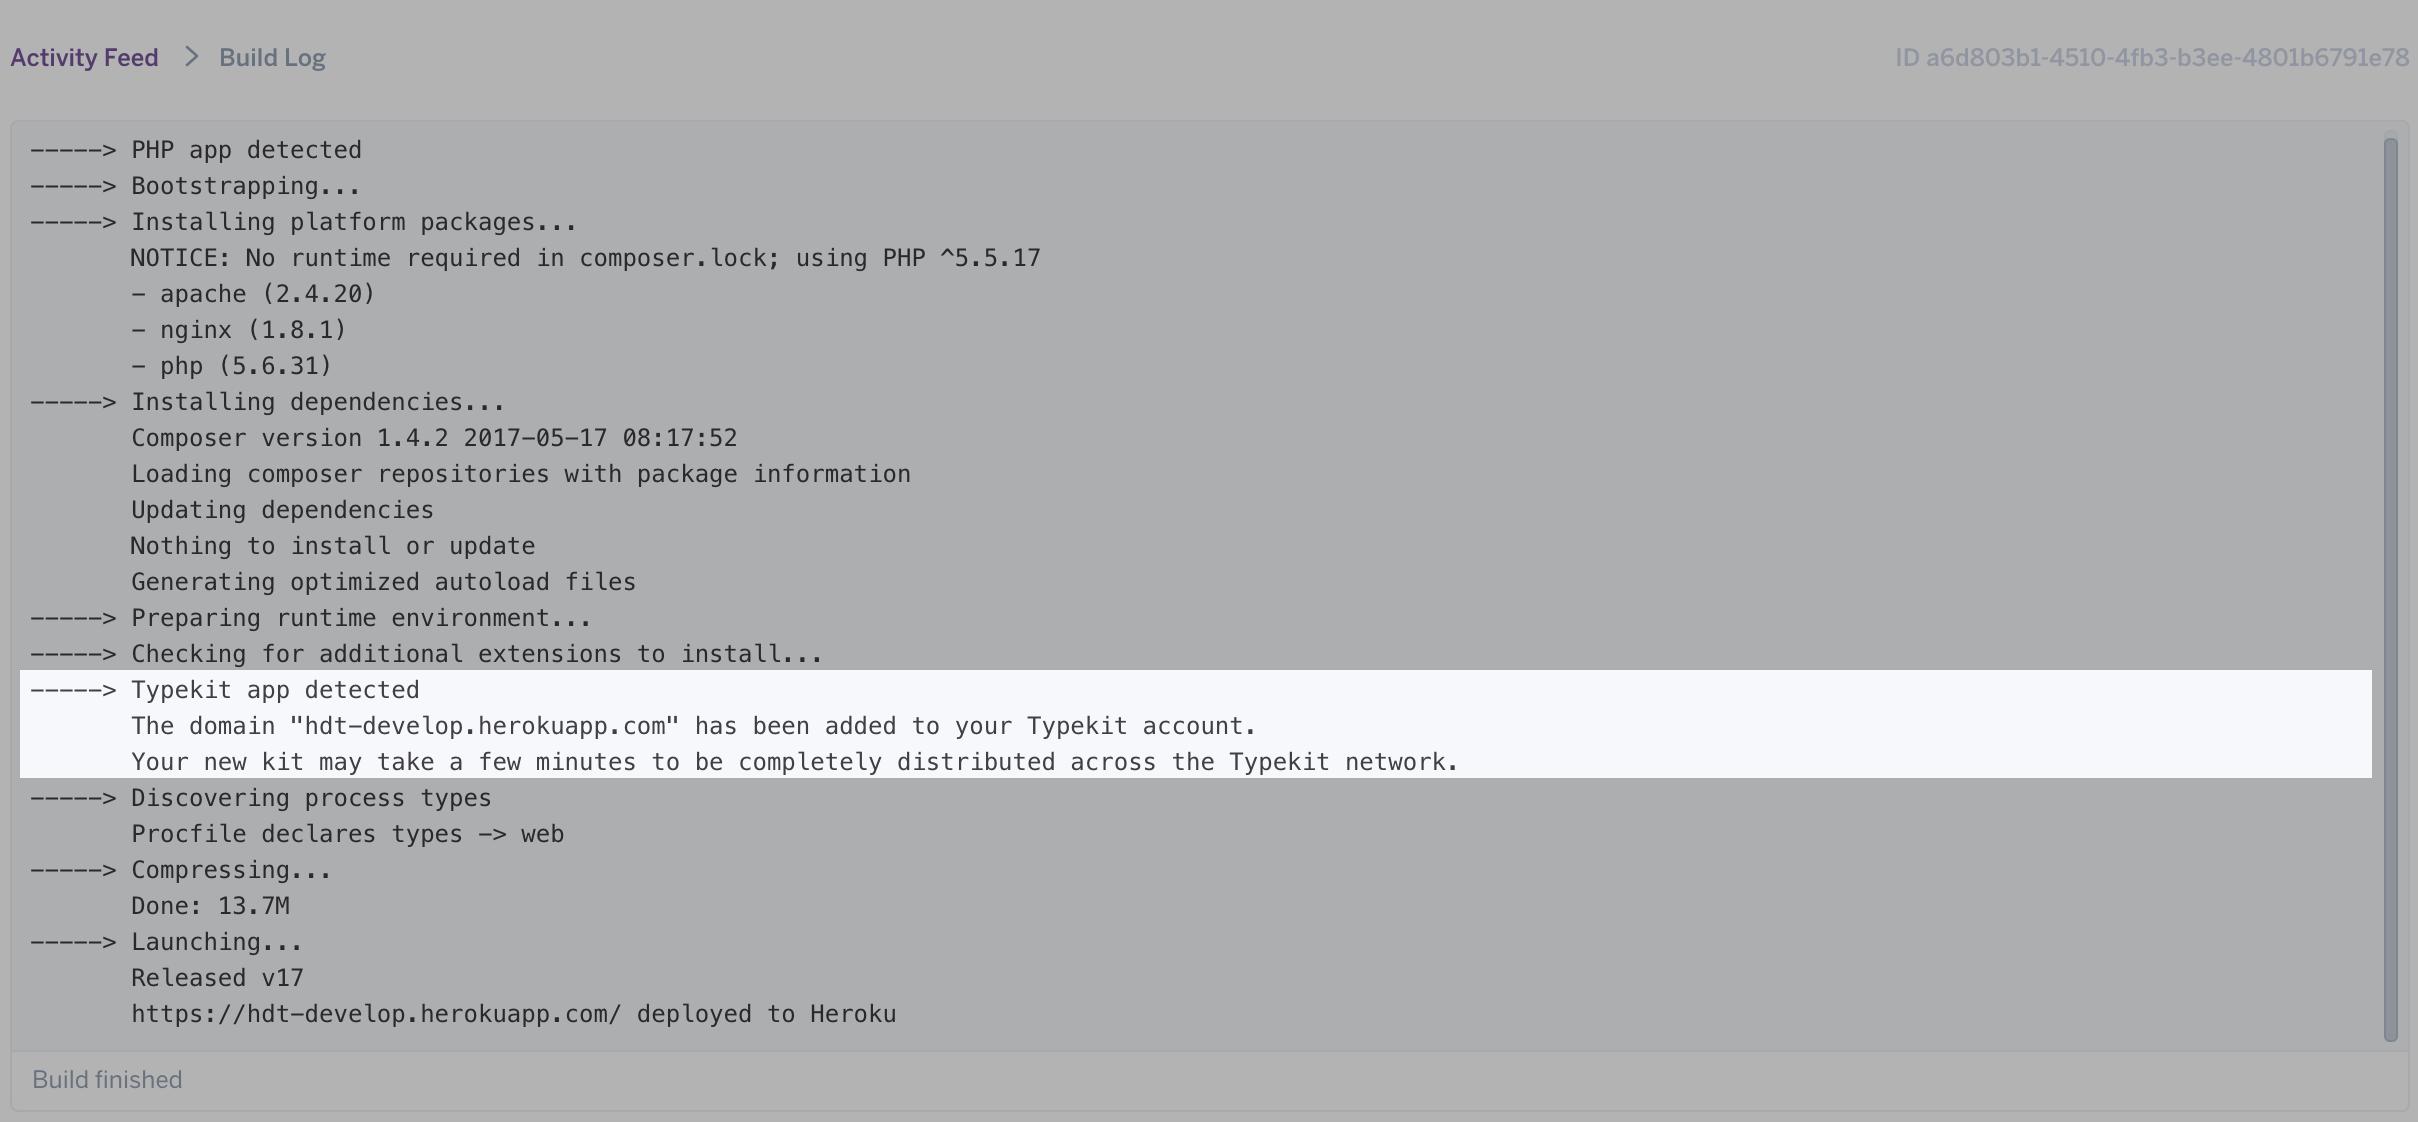 Heroku Typekit Domain Added